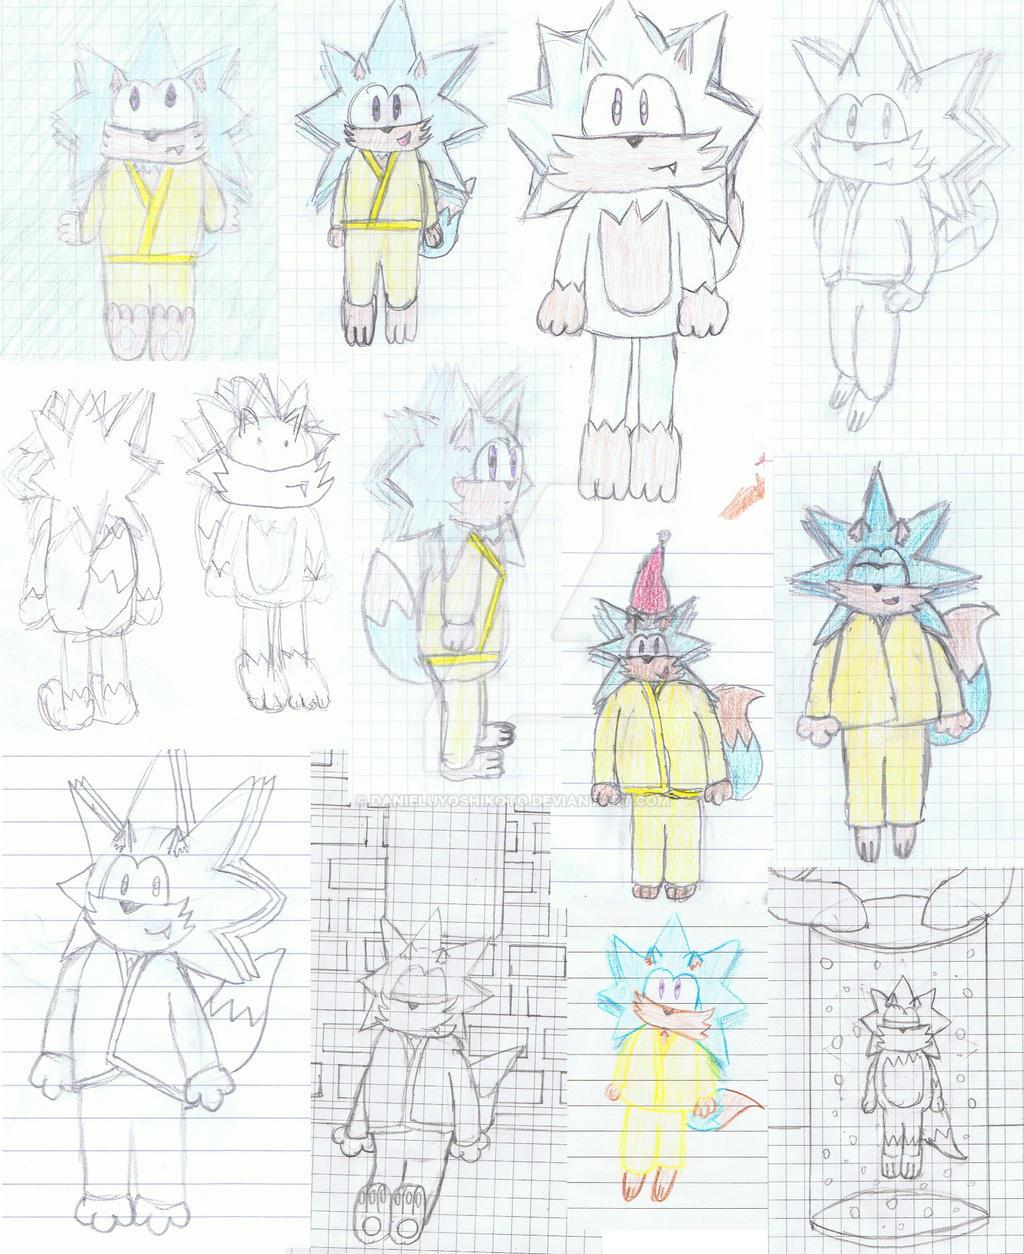 [Collection] Ooki 2009 by DanieluYoshikoto